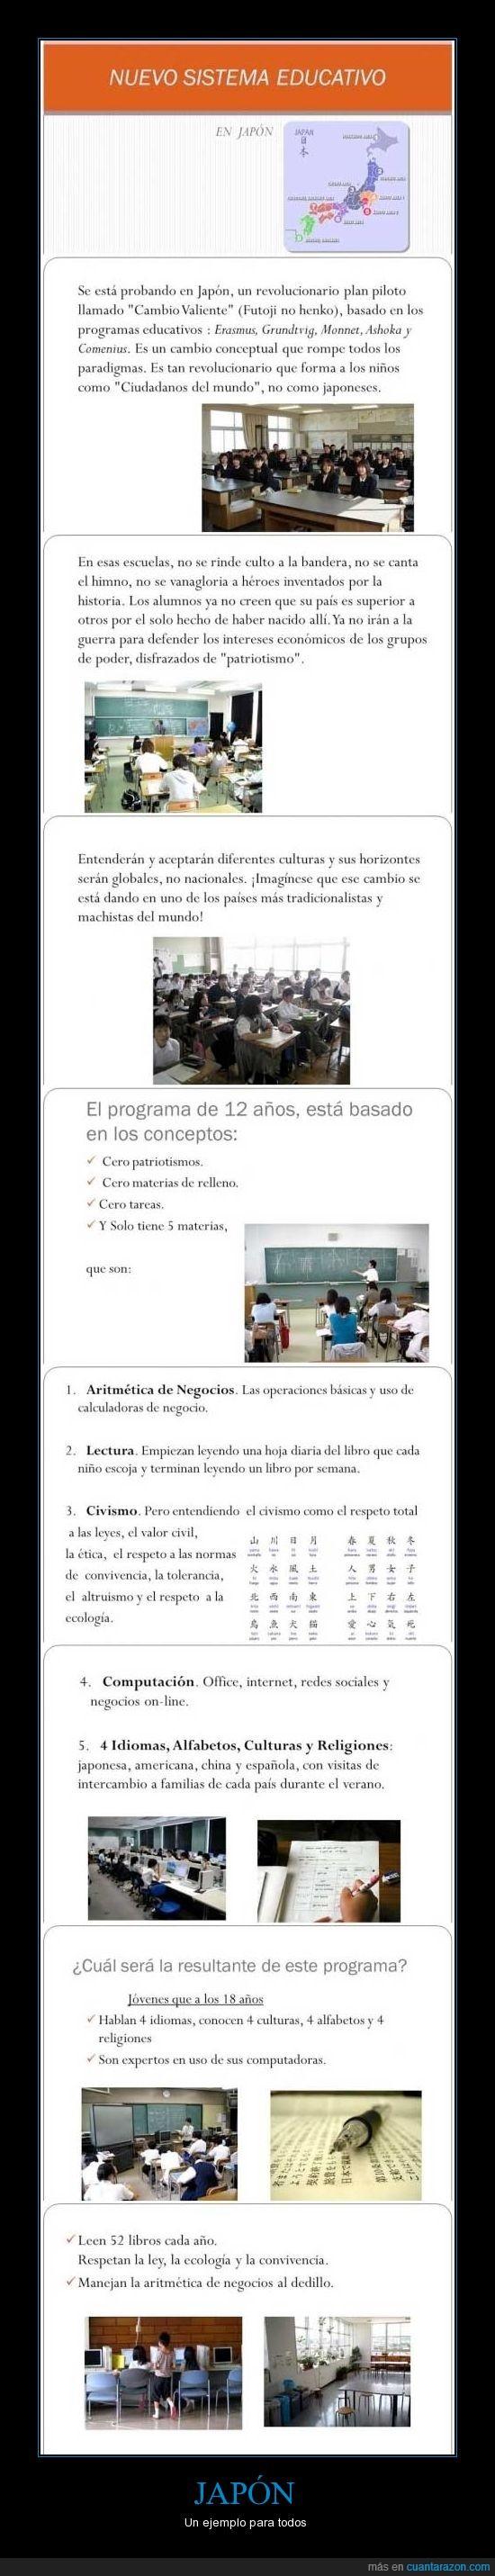 educacion,internet,latinoamerica,liderazgo,paises